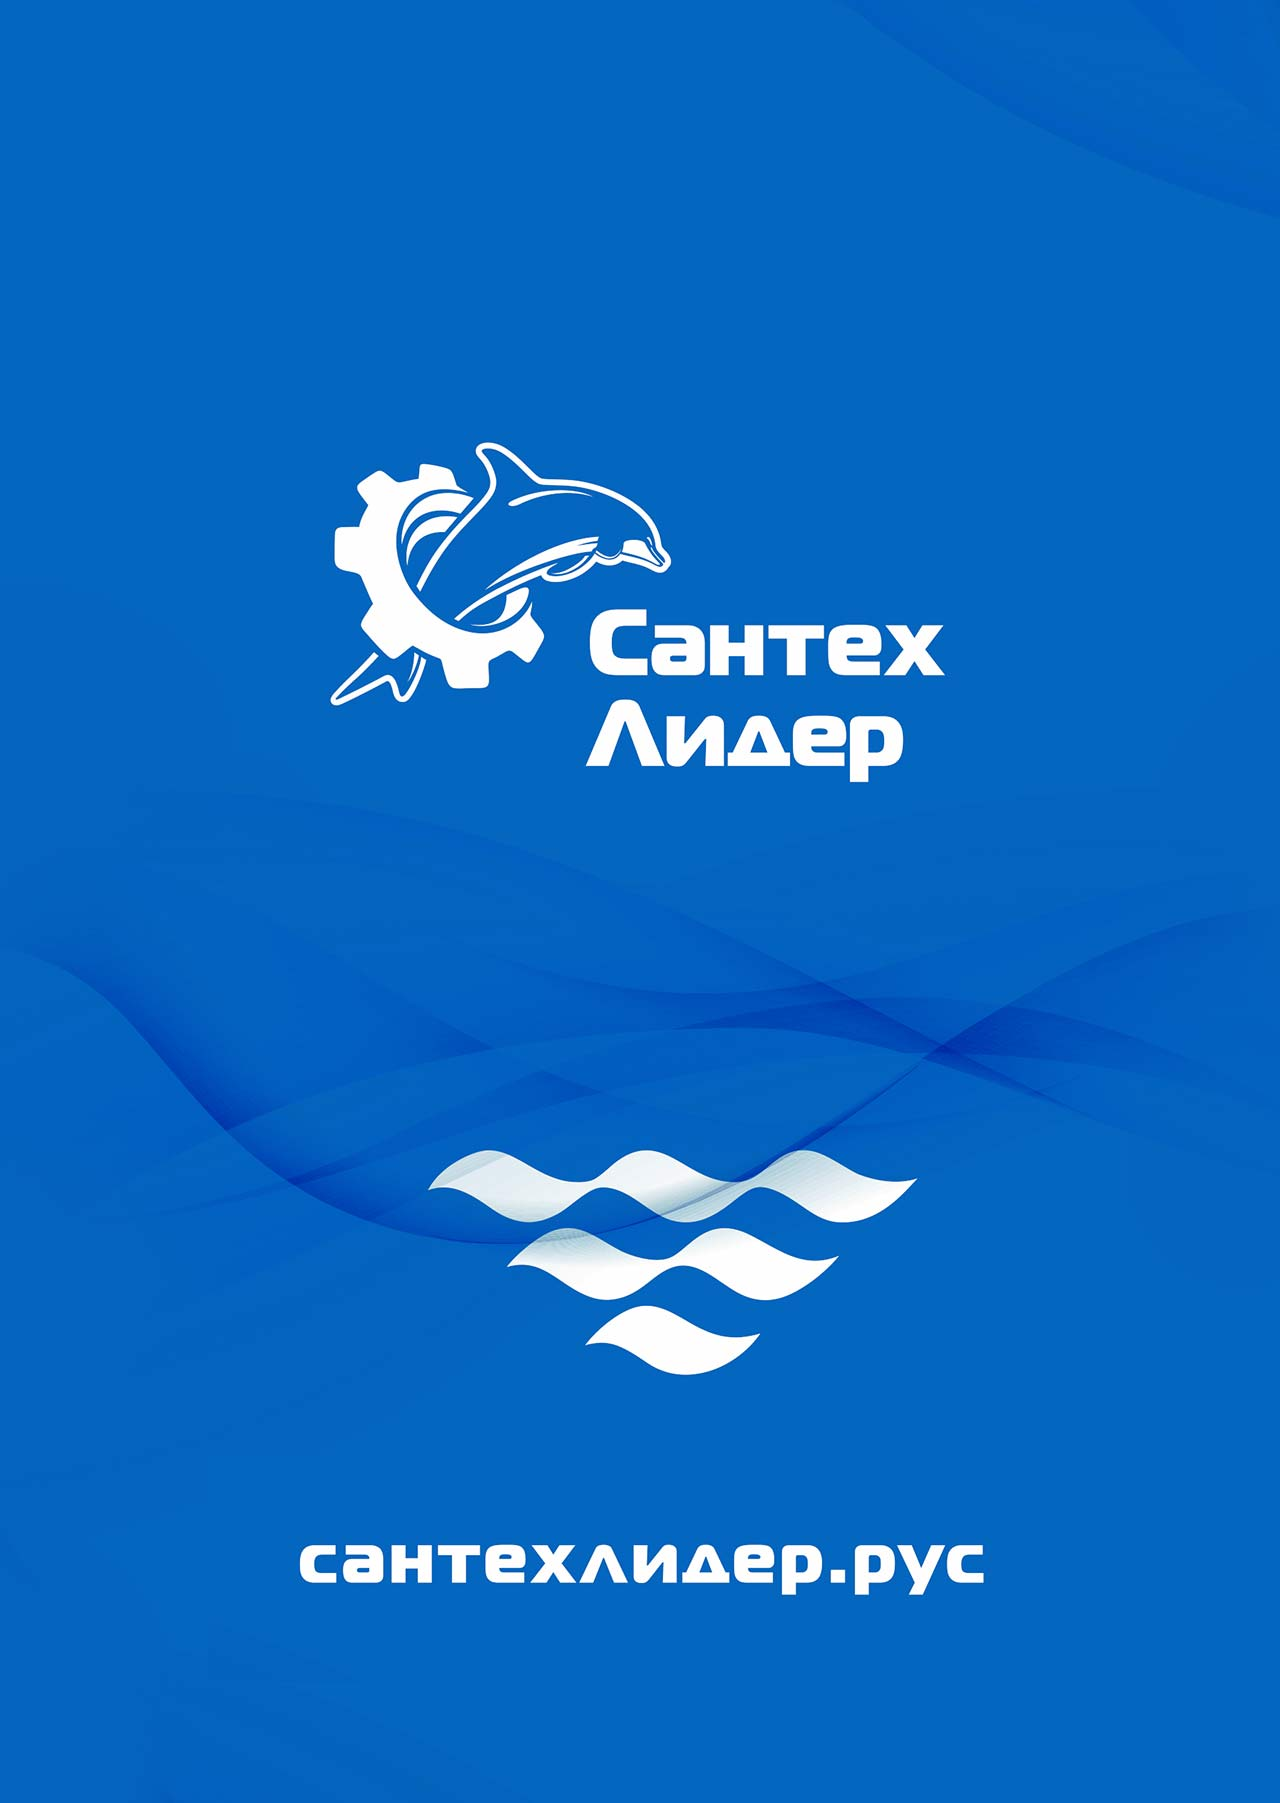 логотип сантехнического магазина